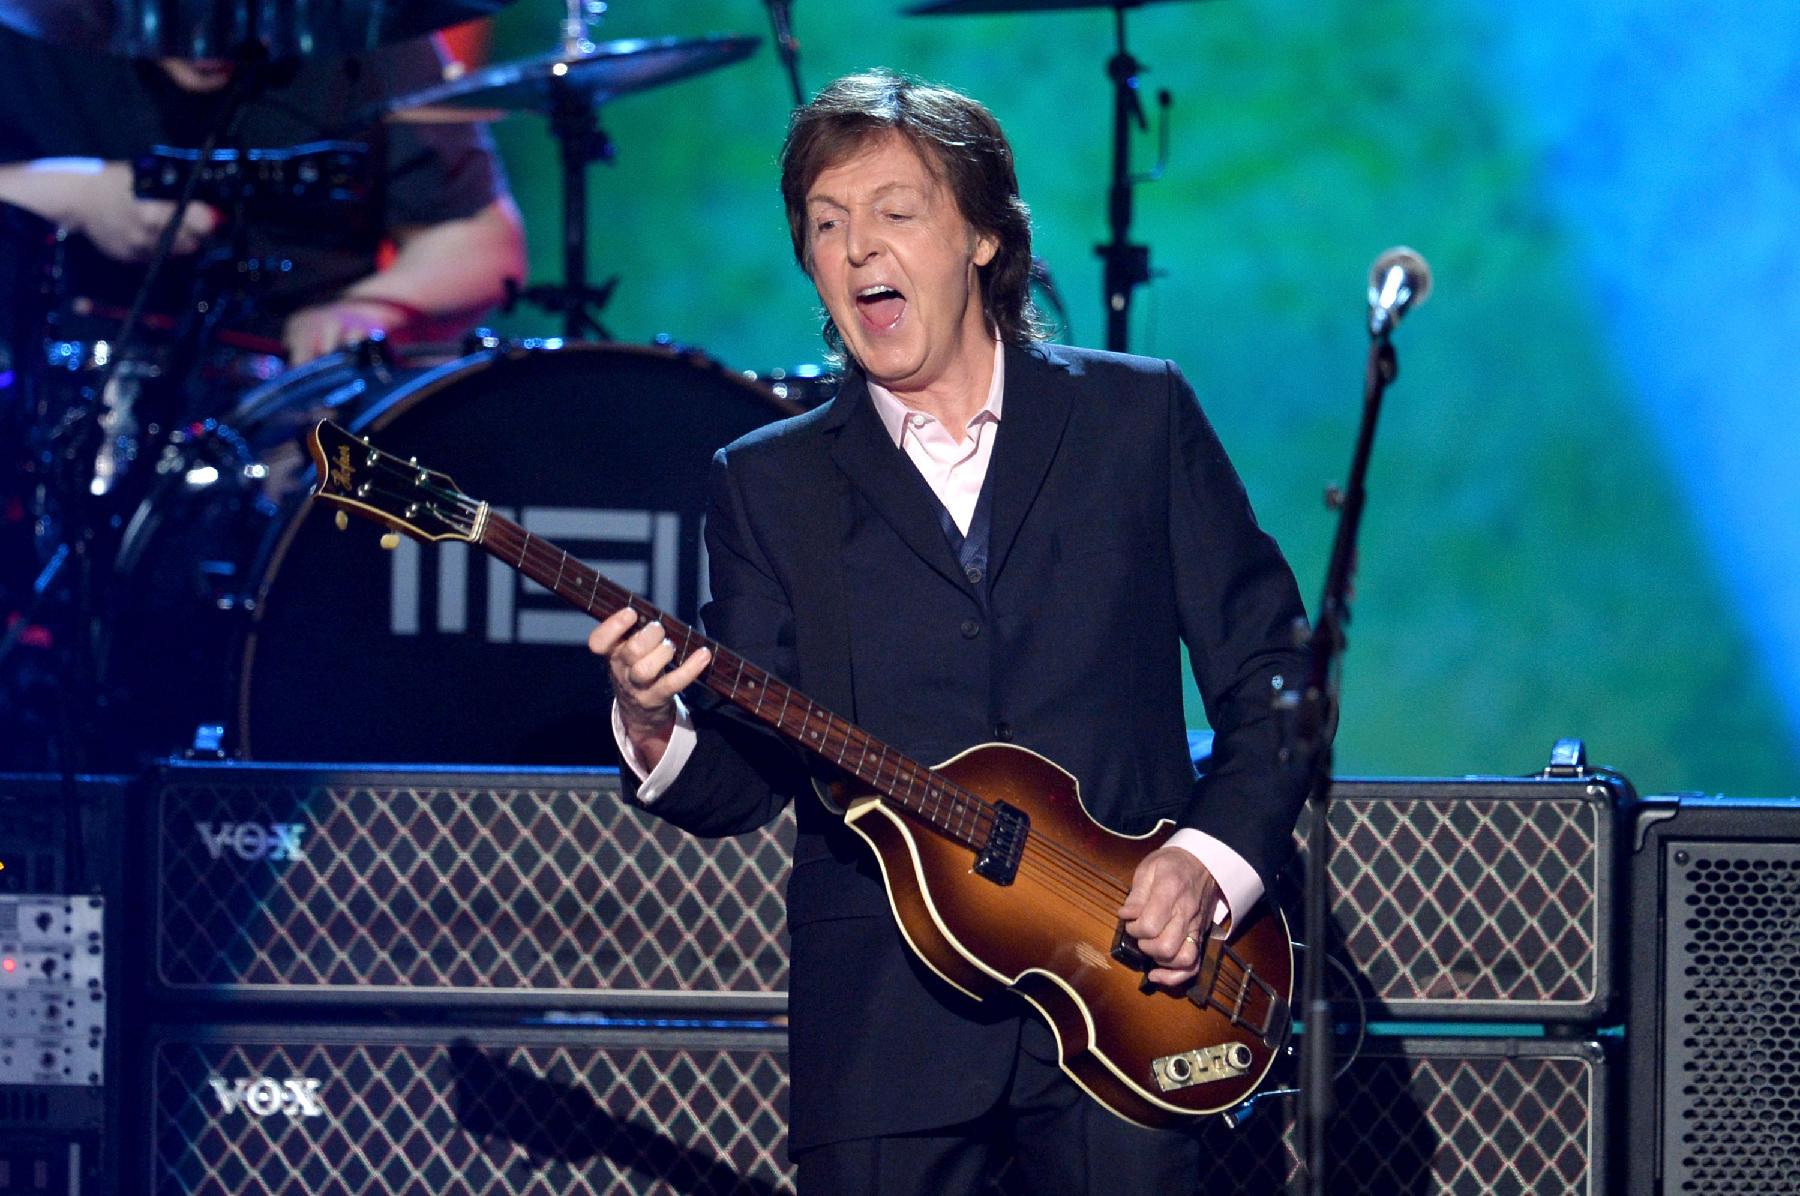 Paul McCartney's Tour Postponement Has Ripple Effect Through Industry